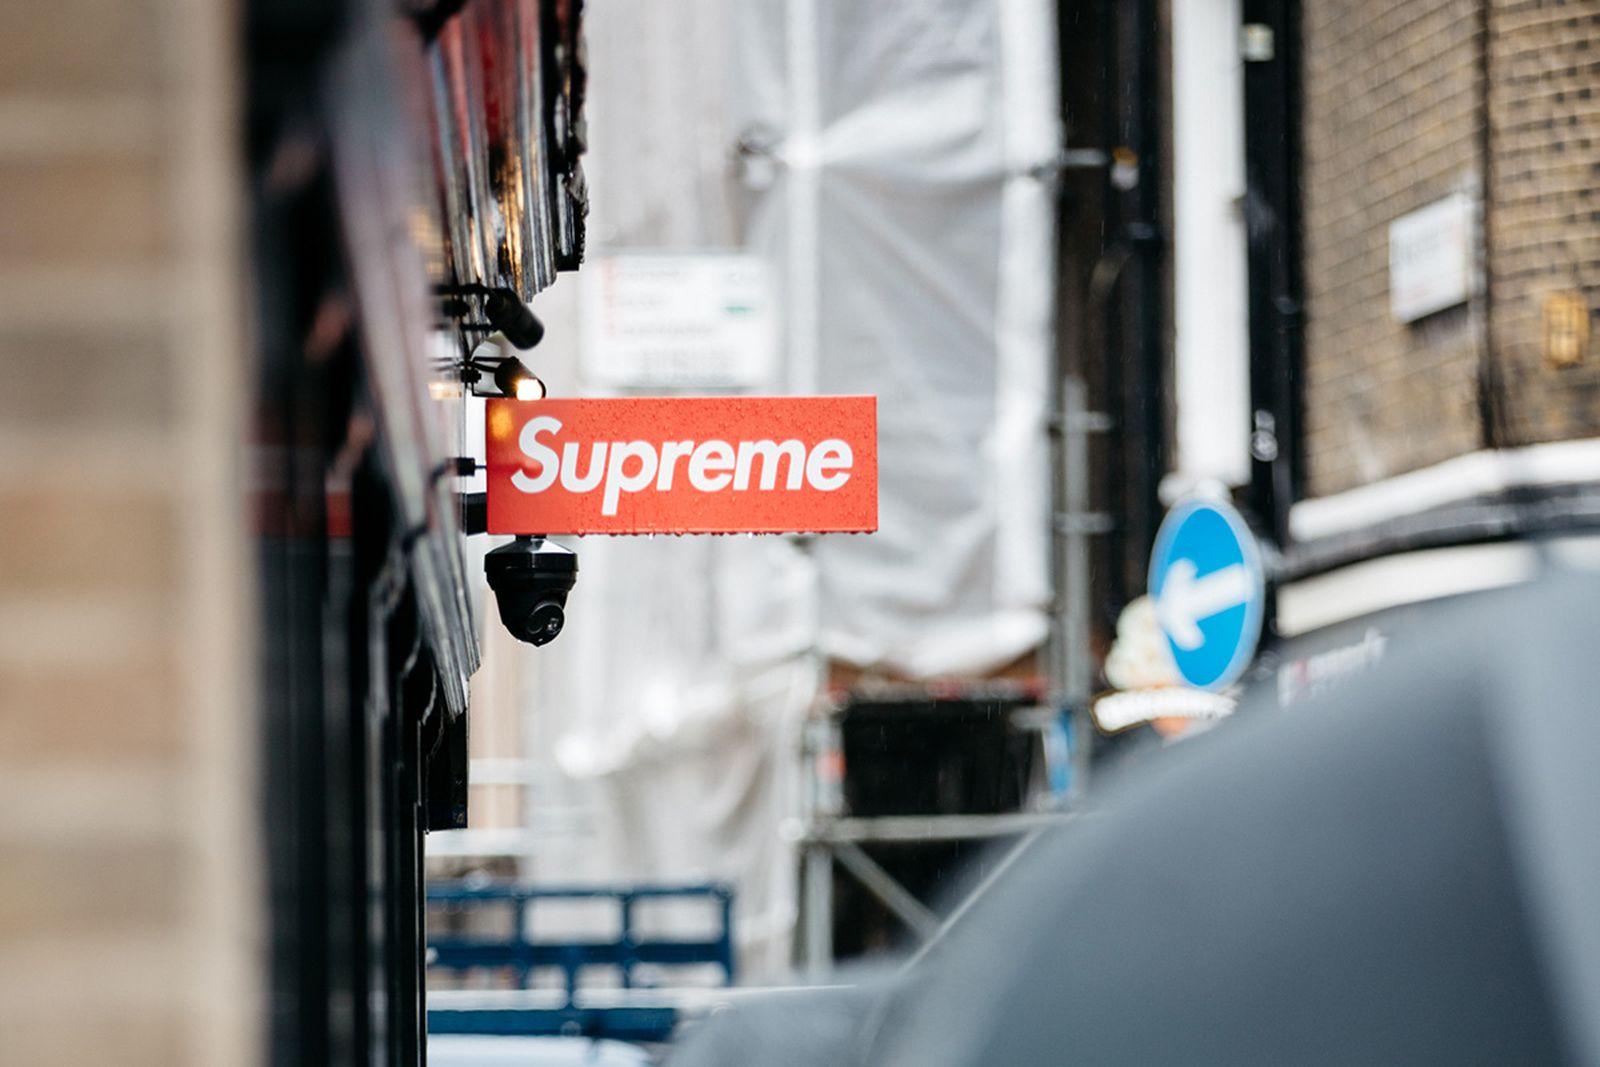 supreme london storefront vandalized reward